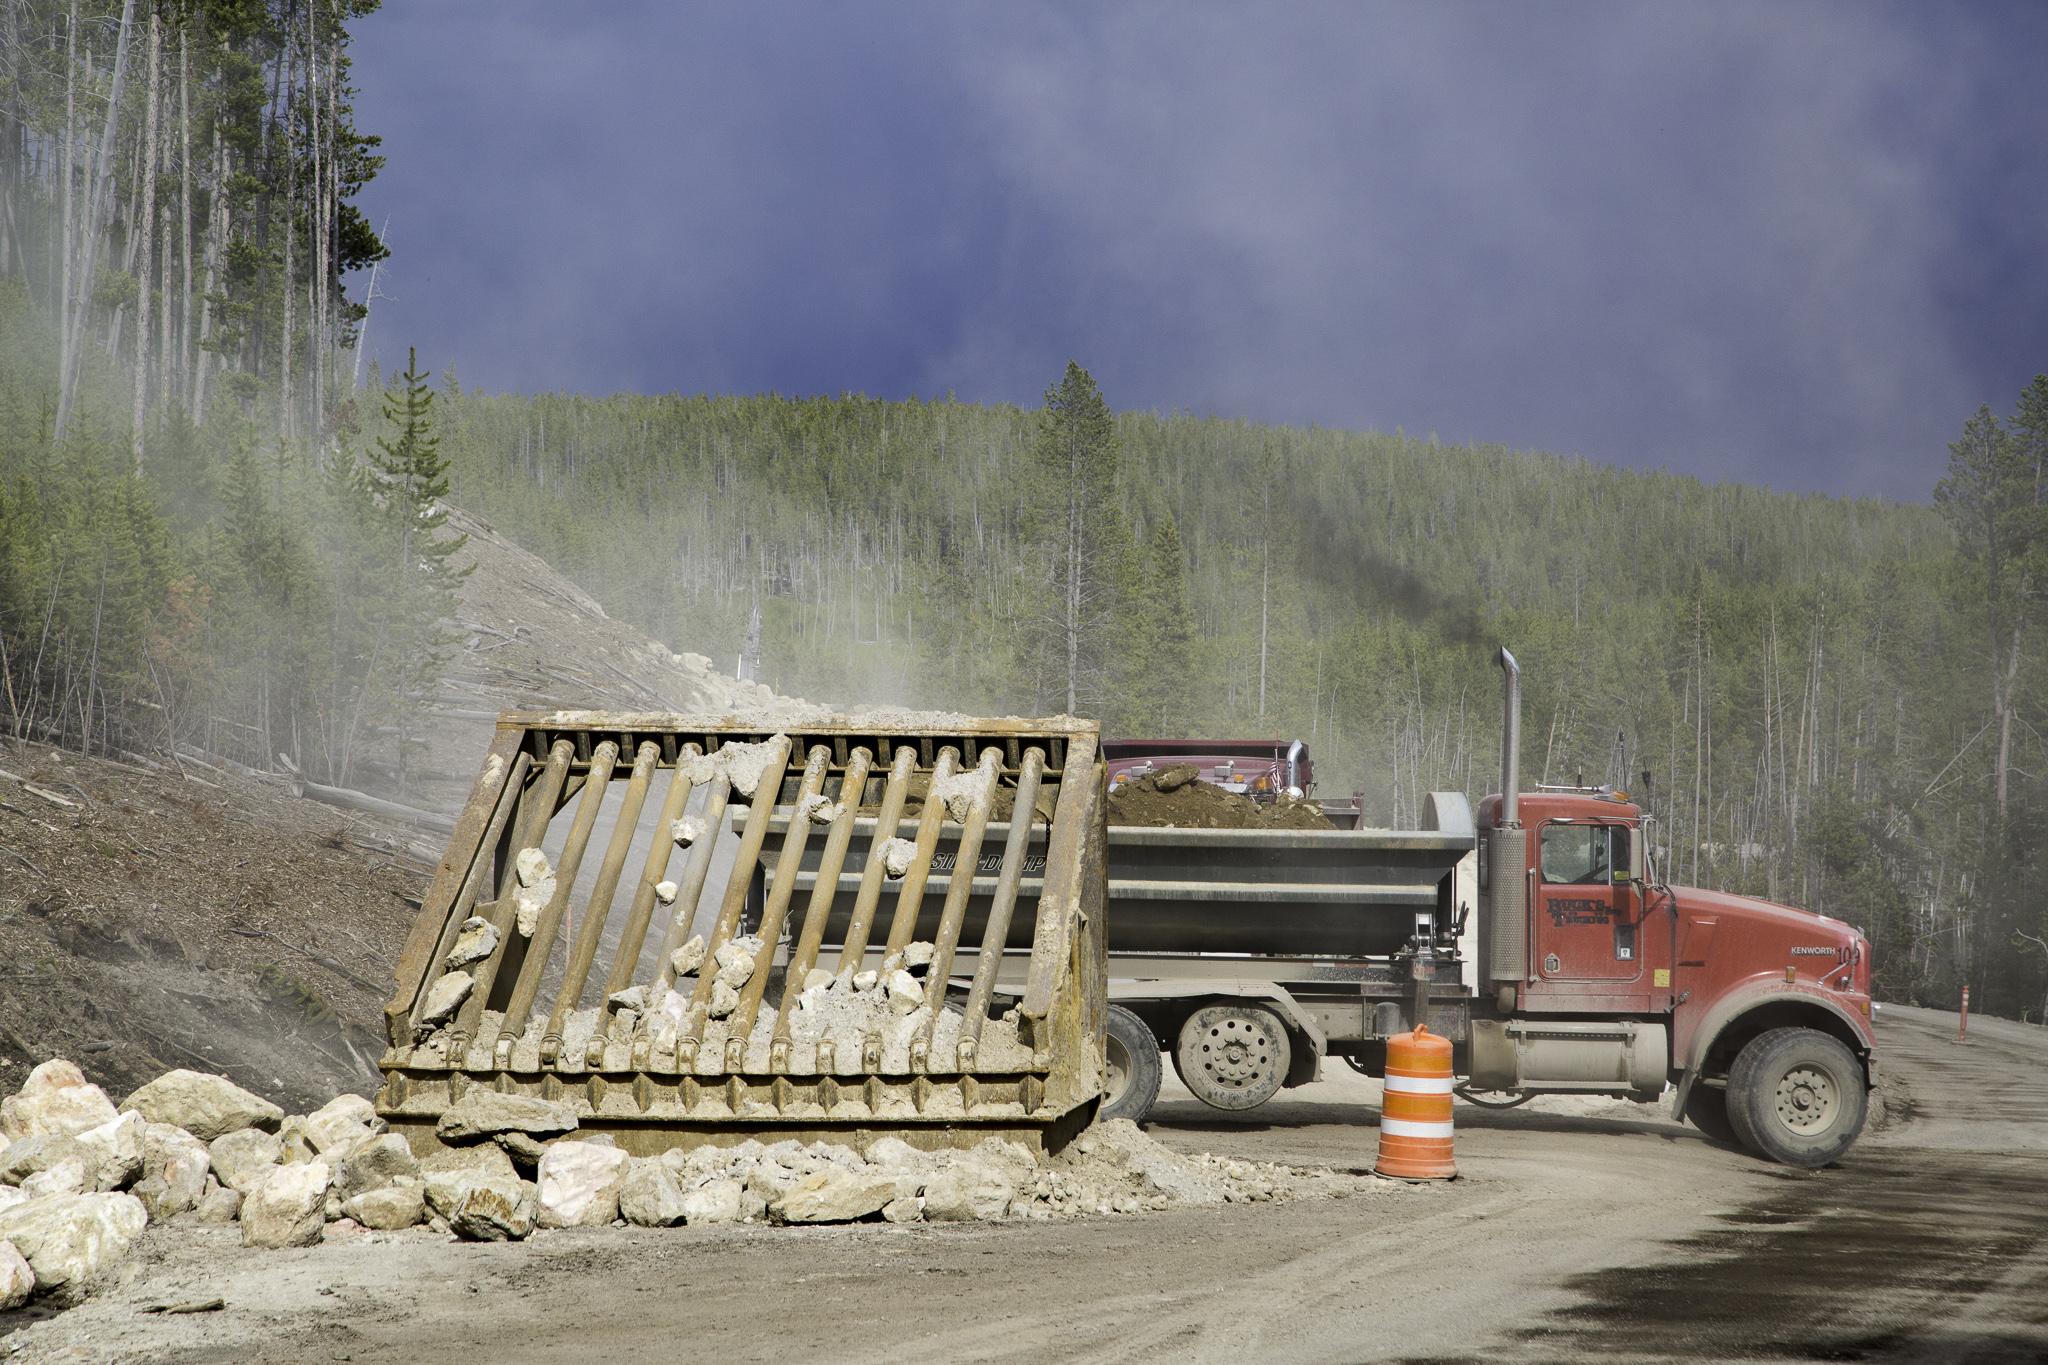 Yellowstone National Park (NPS image)